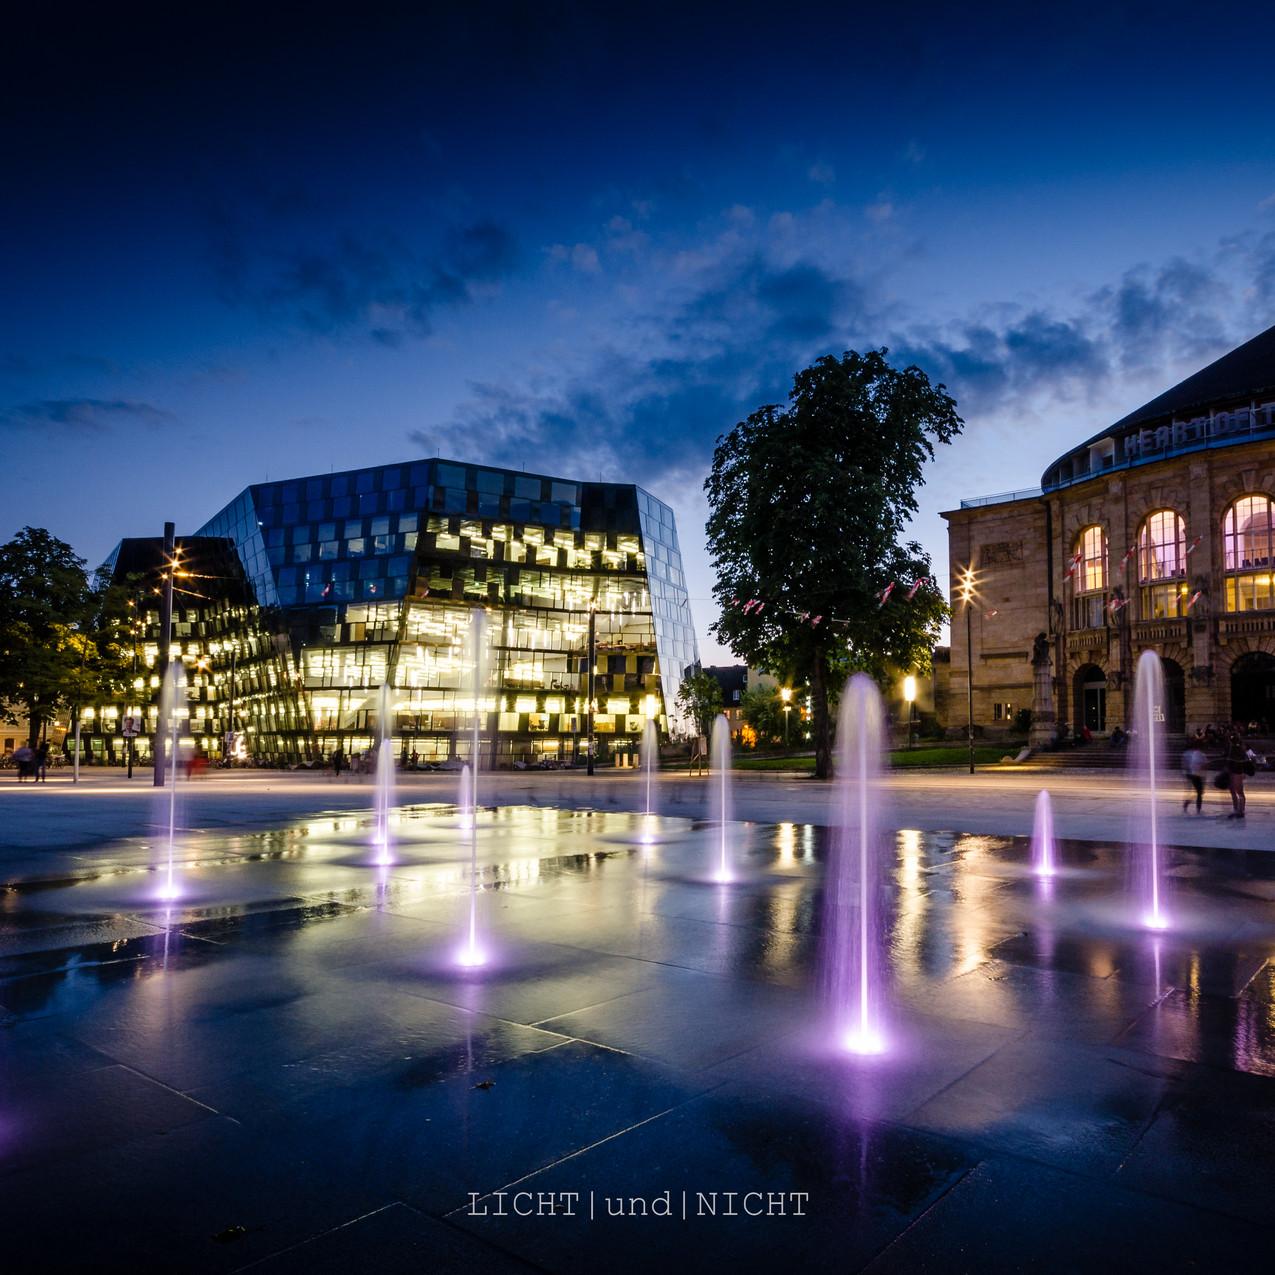 PlatzSynagoge_Fountain